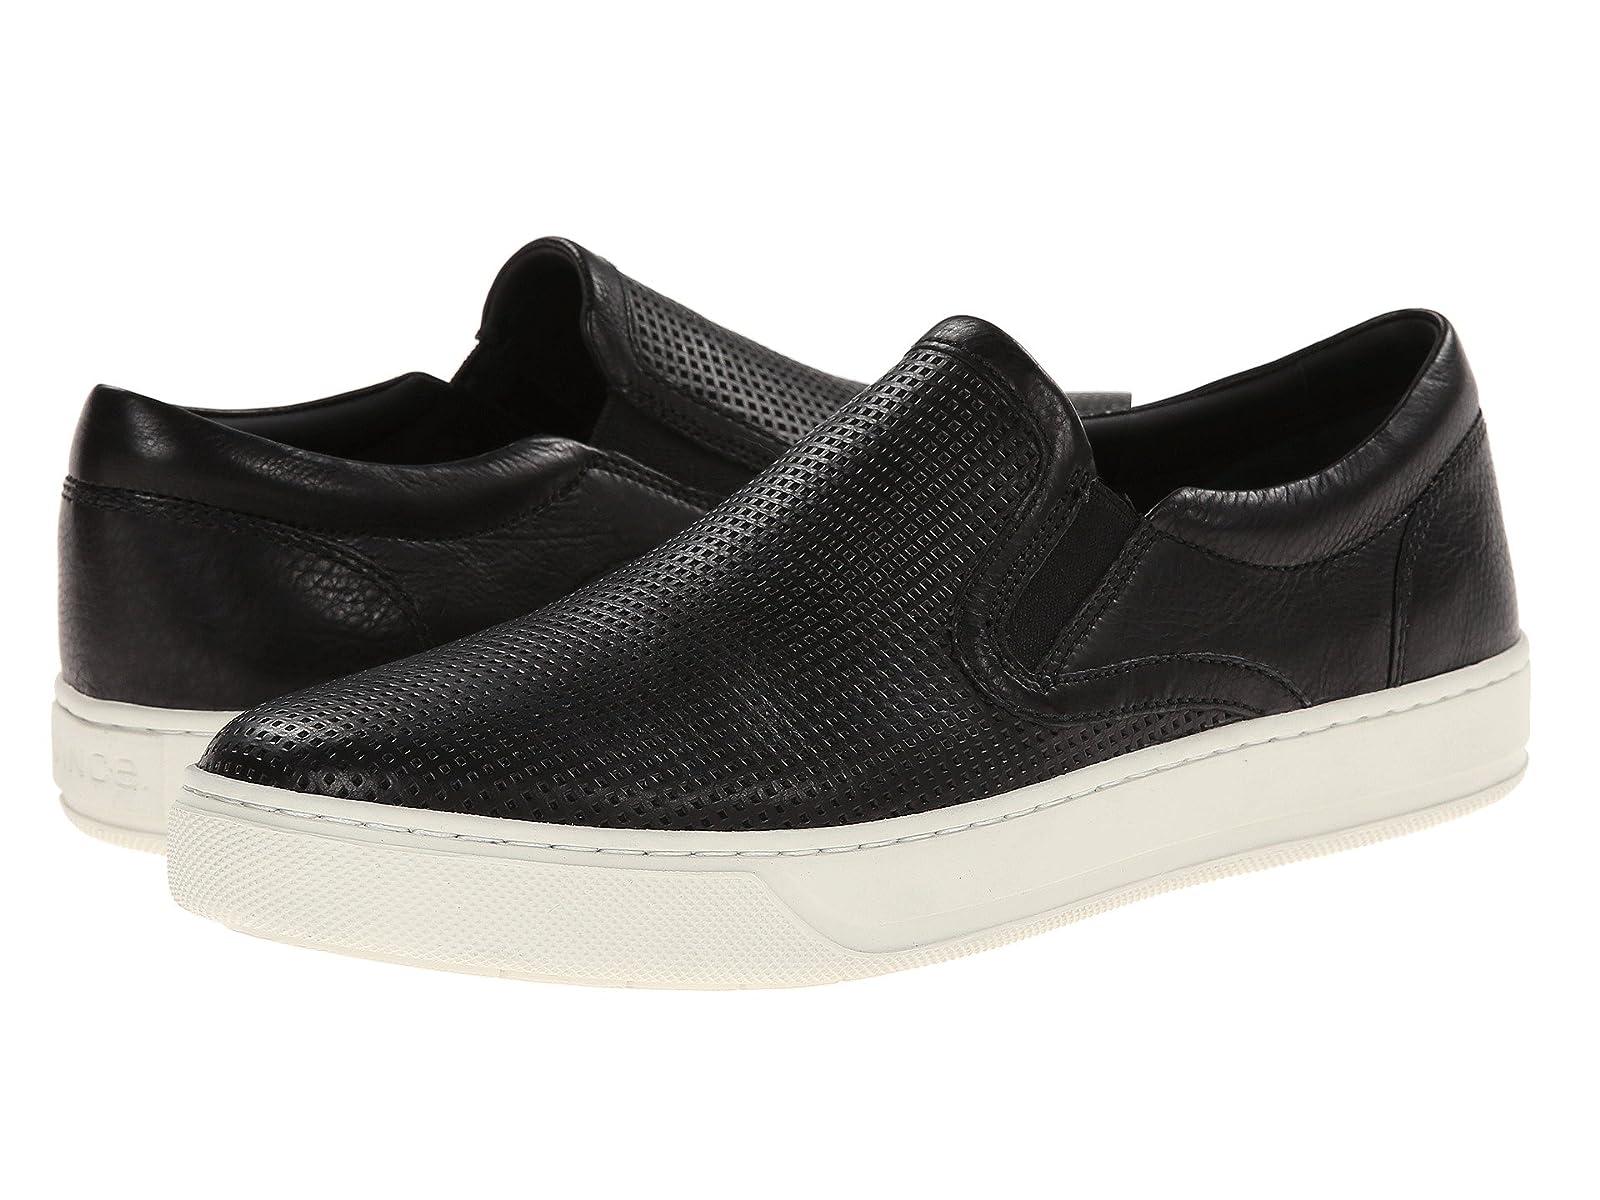 Vince AceAtmospheric grades have affordable shoes